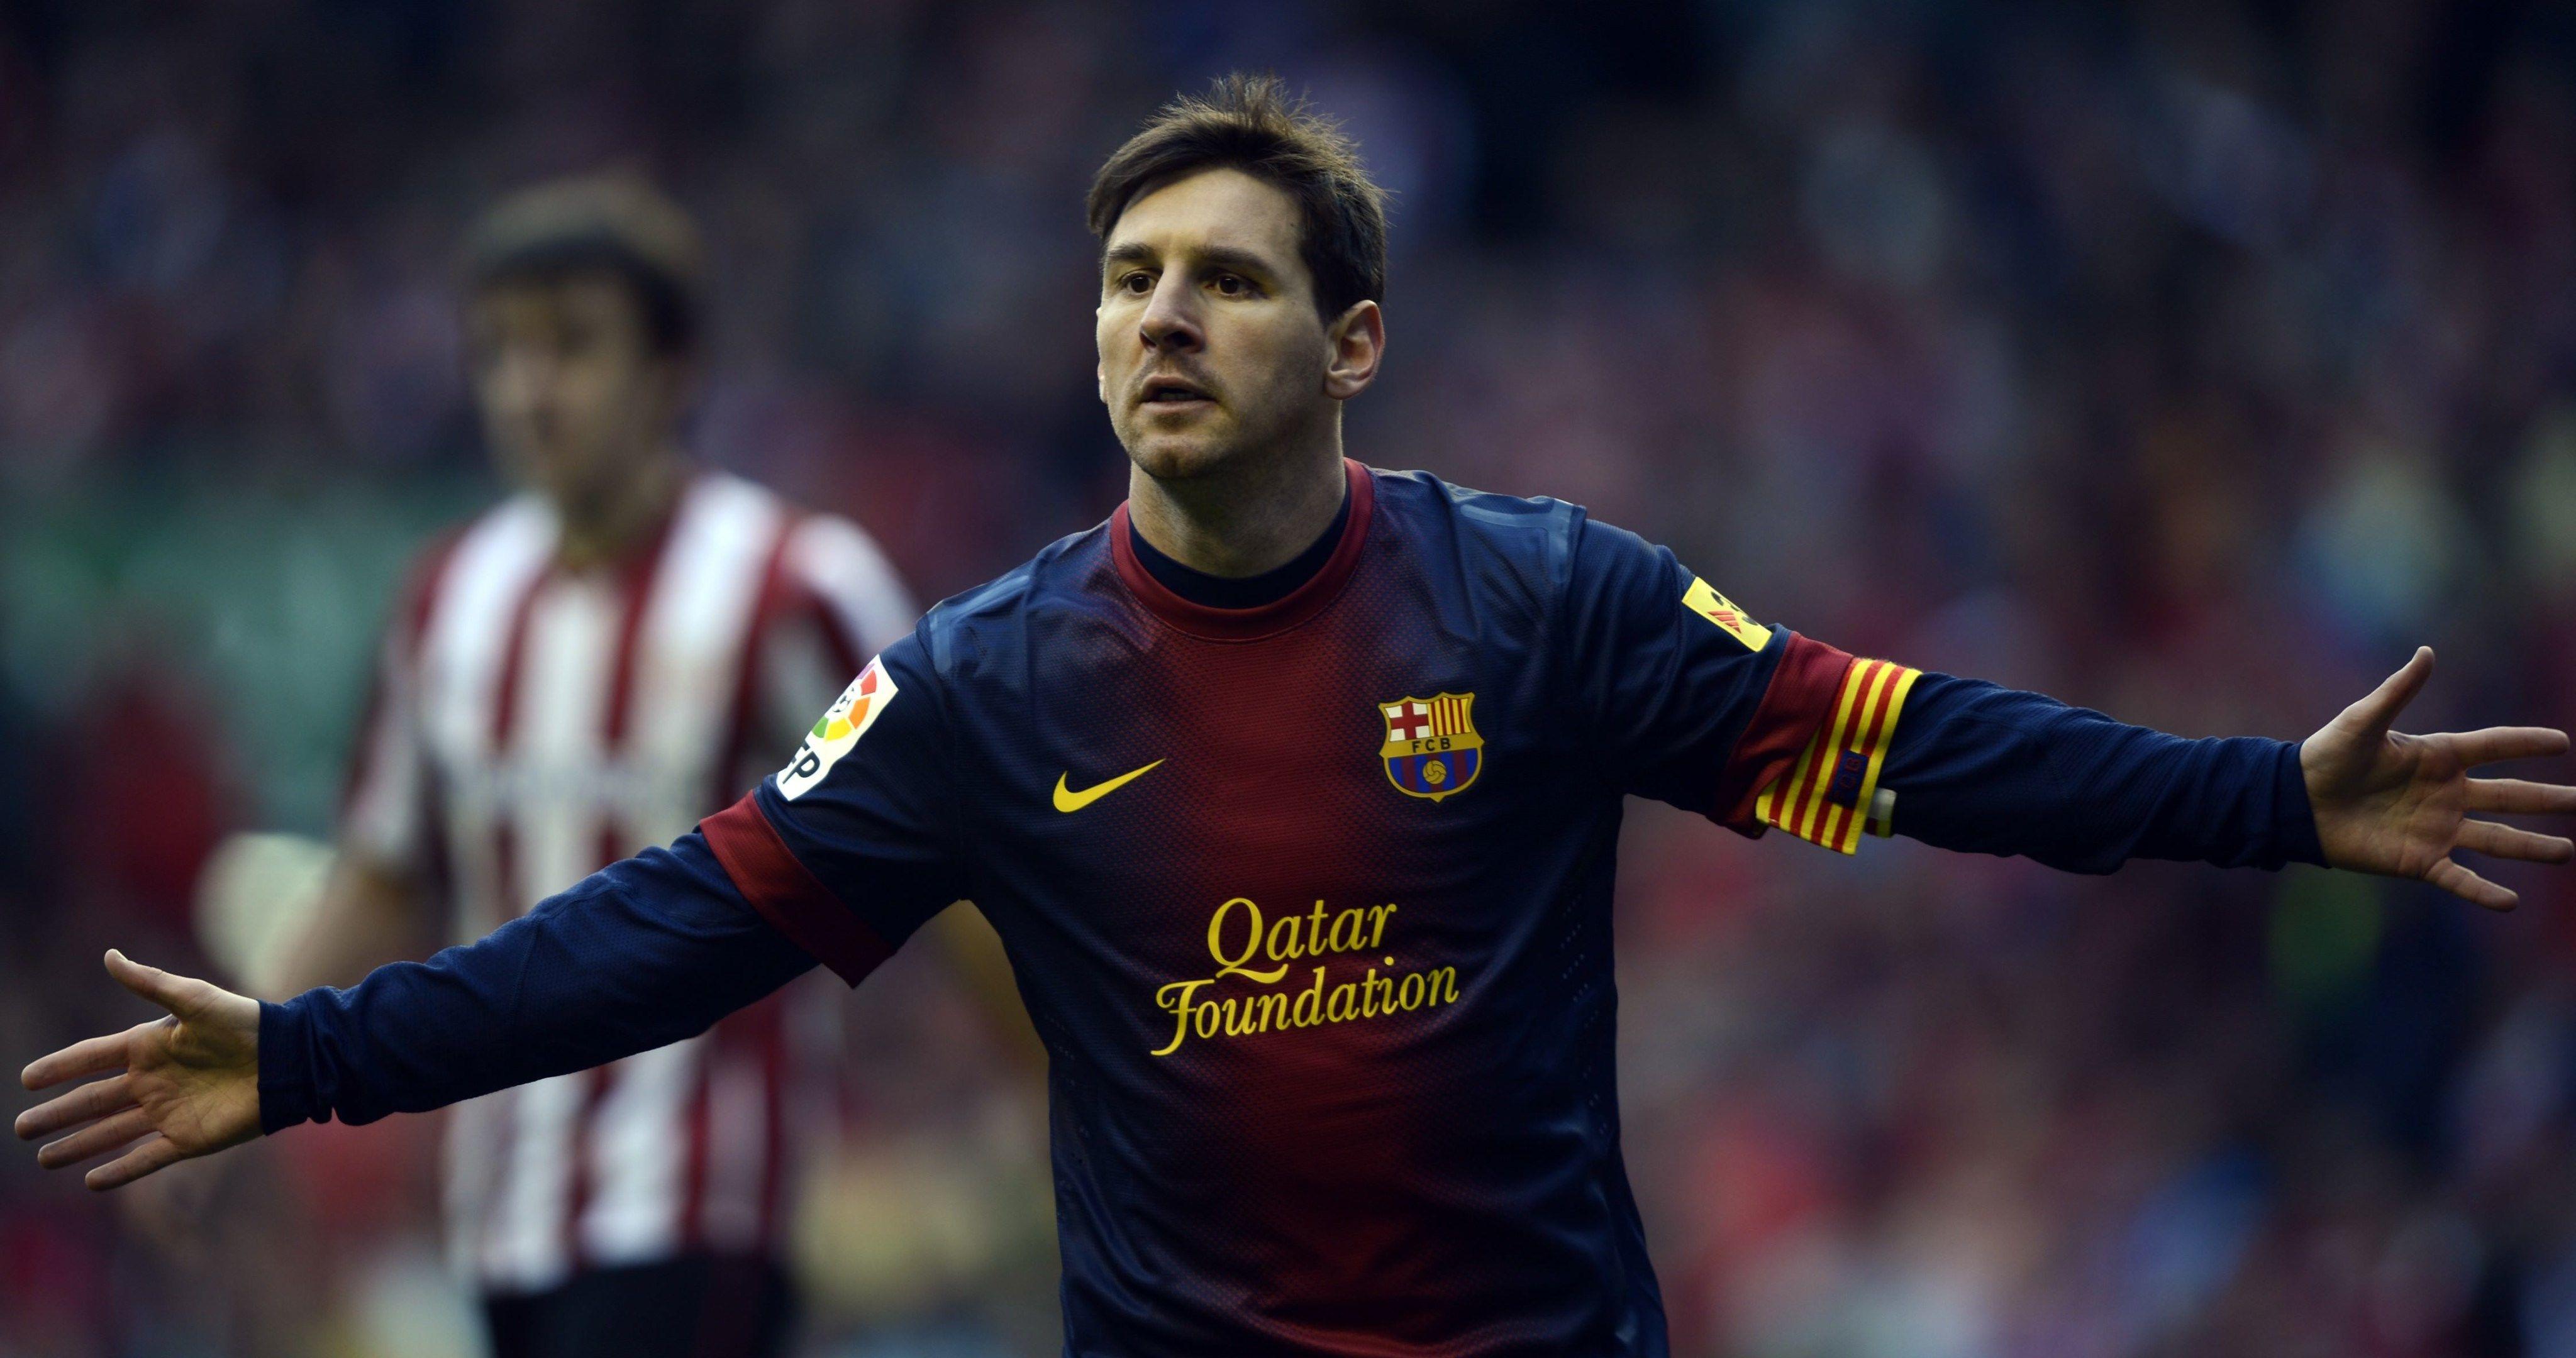 Messi Barcelona 4k Ultra Hd Wallpaper Lionel Messi Messi